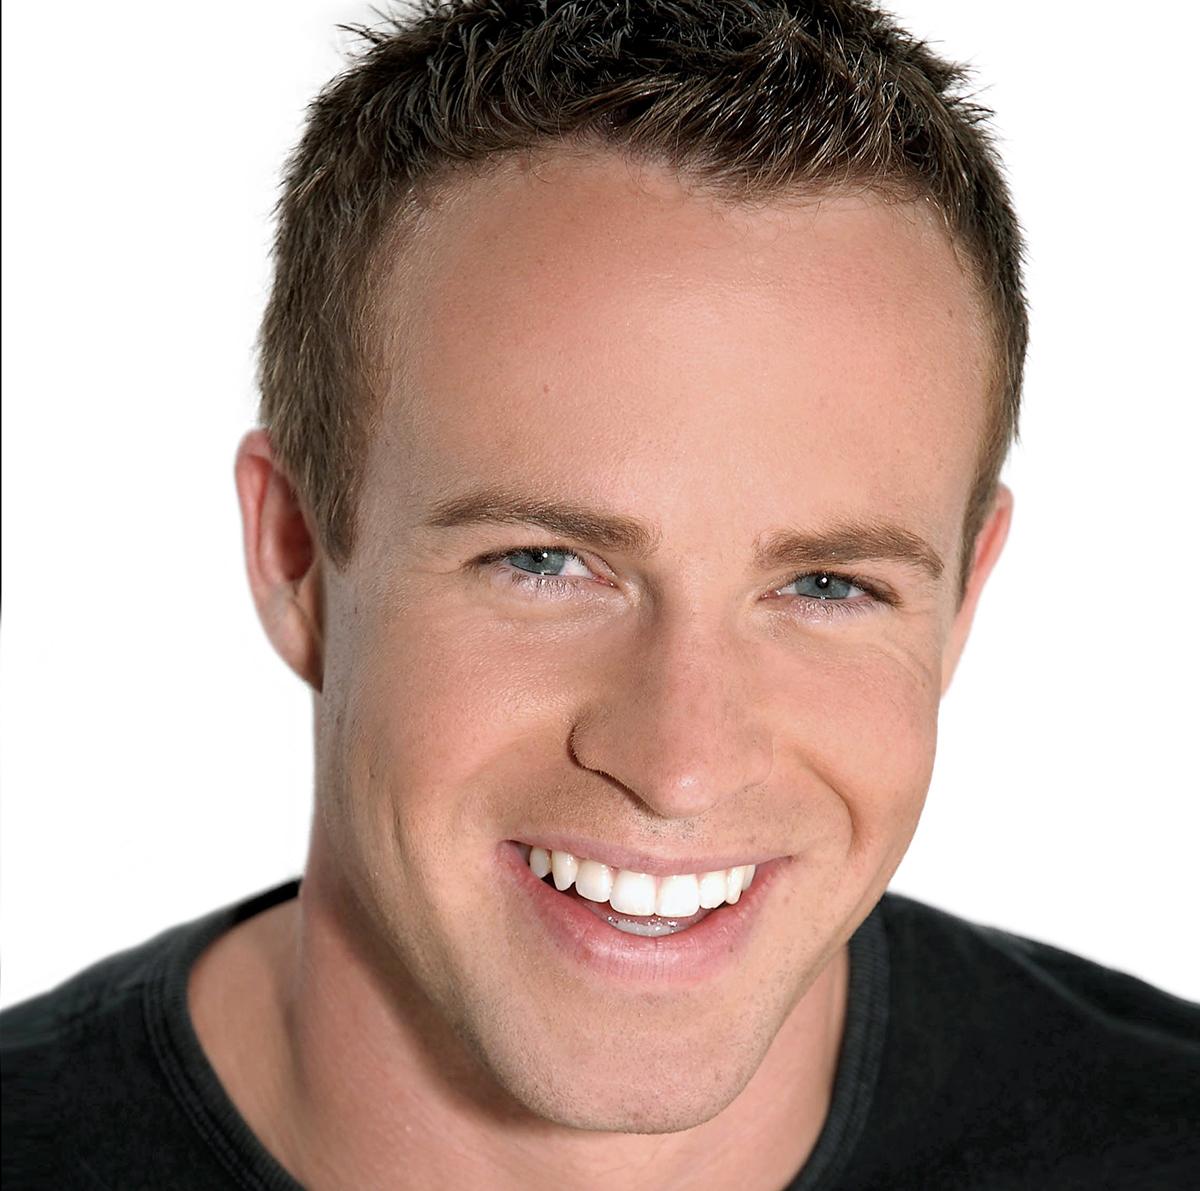 Adrian James HEADSHOT (D)